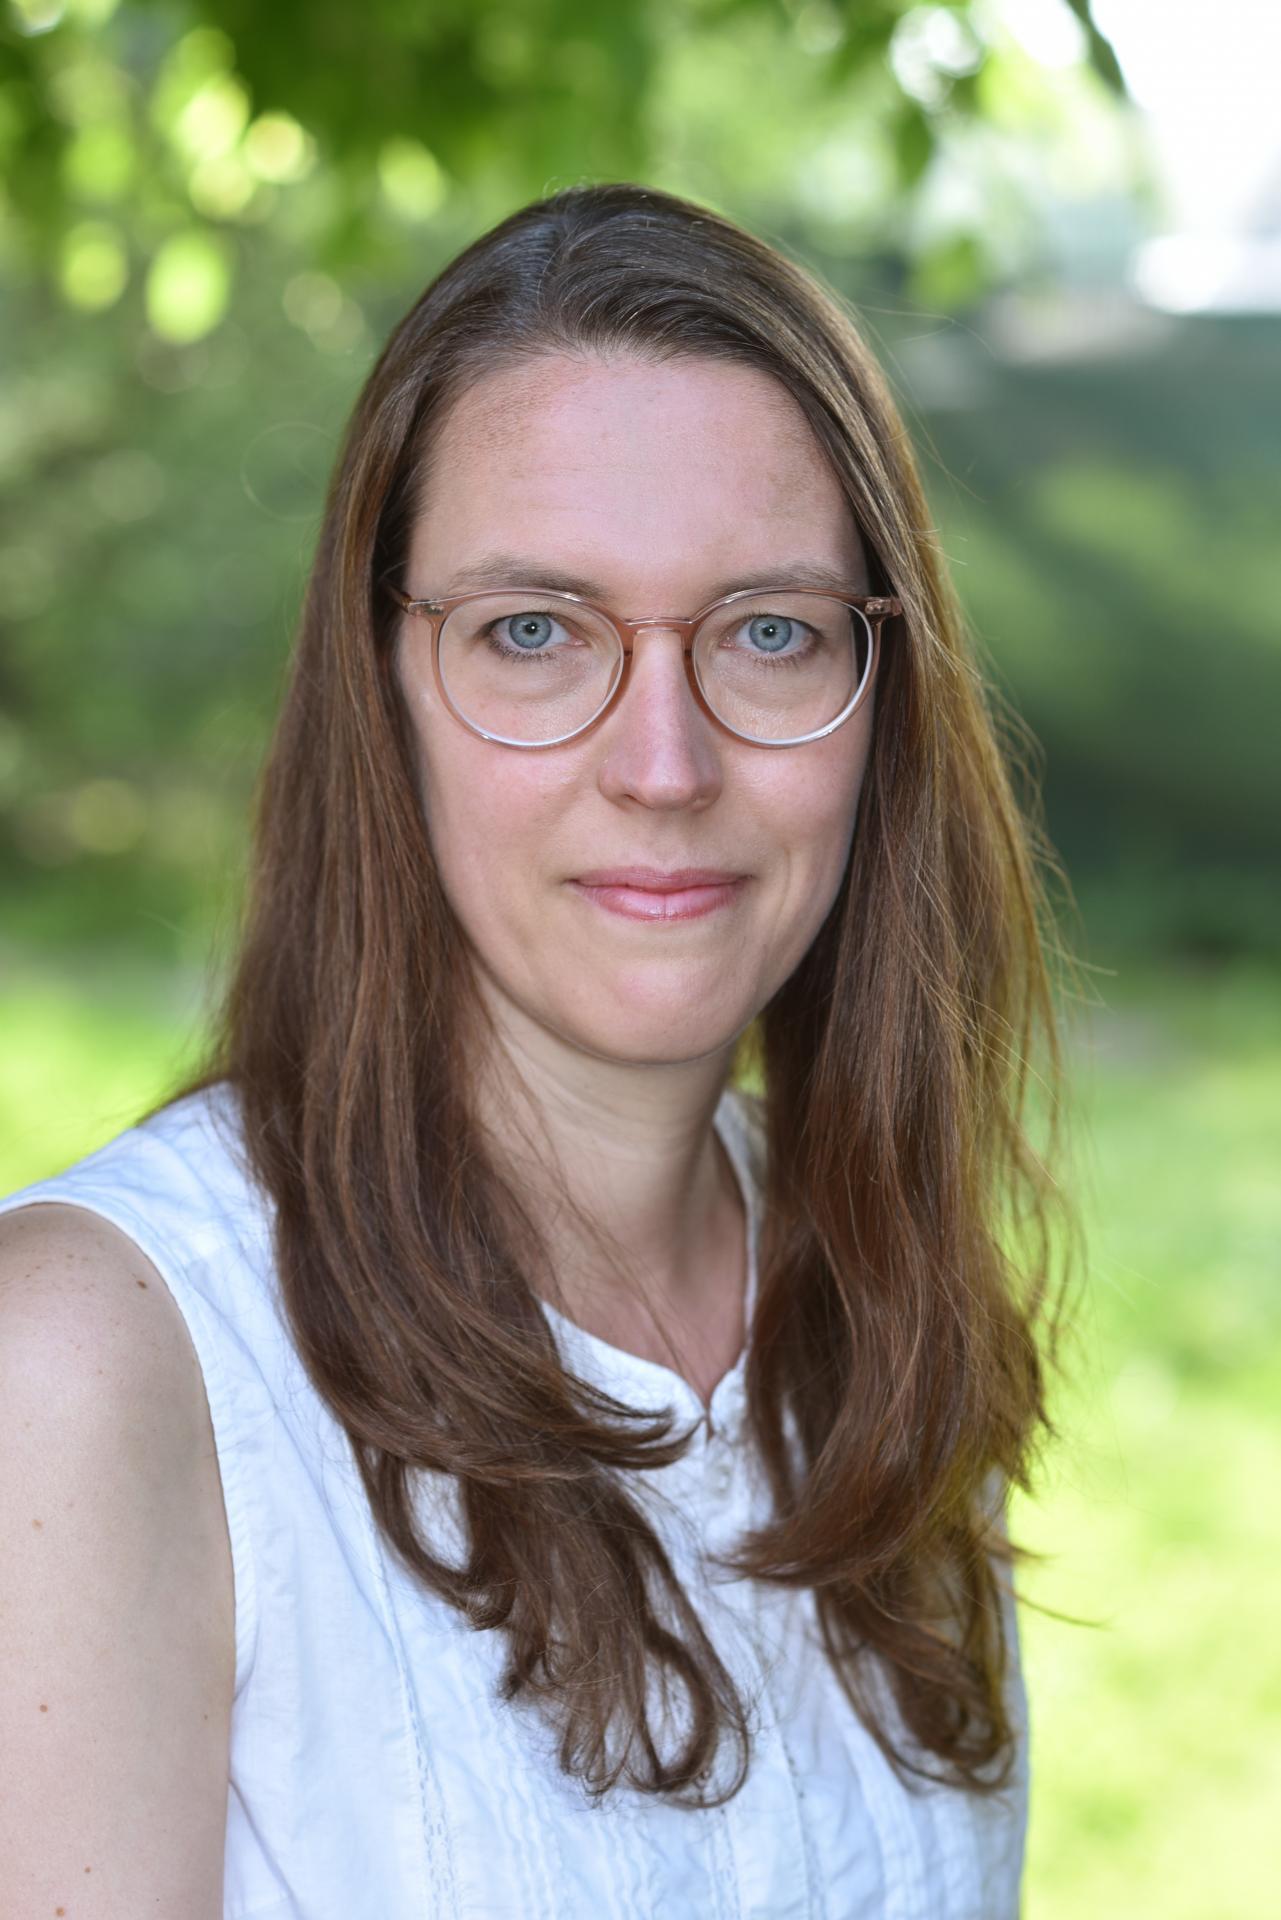 Monika Bockermann